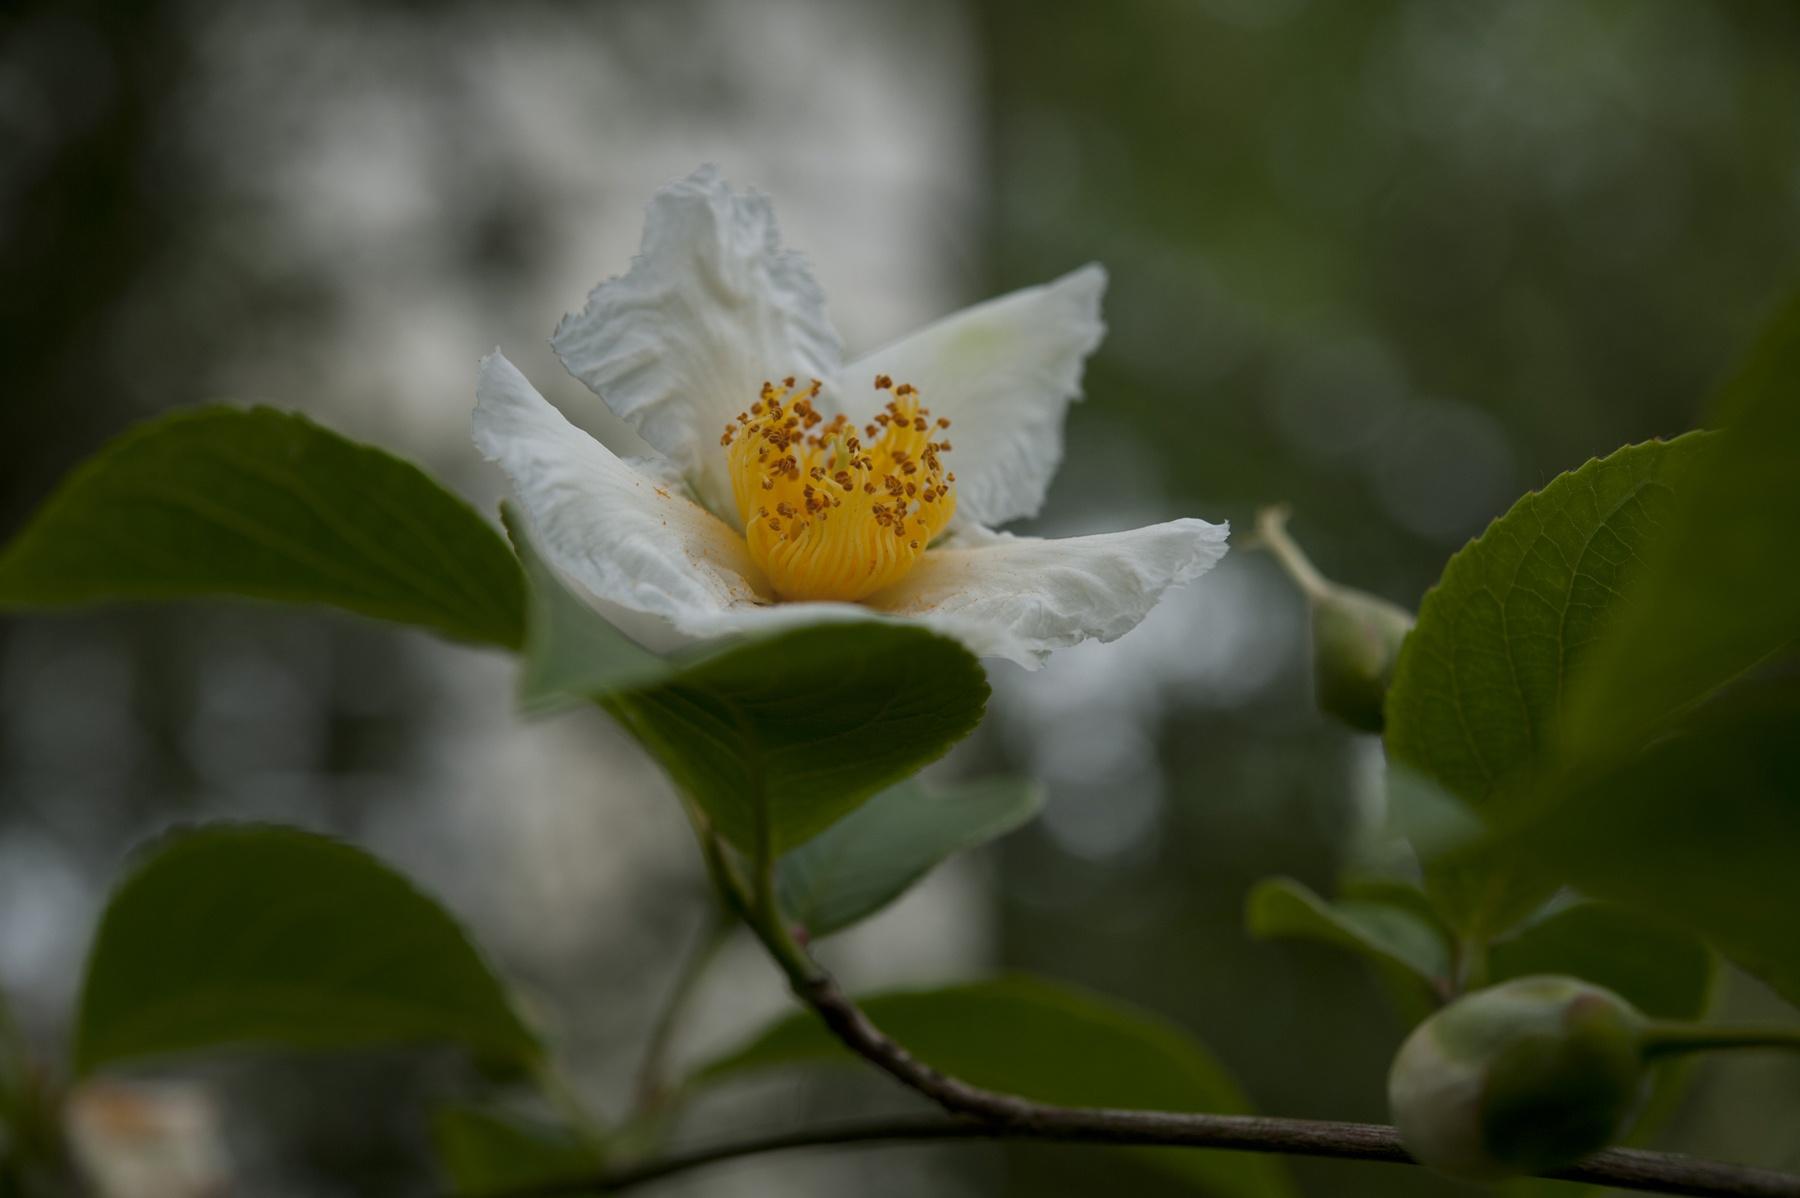 Japansk skenkamelia (Stewartia pseudocamellia). Foto: Karin Berglund.